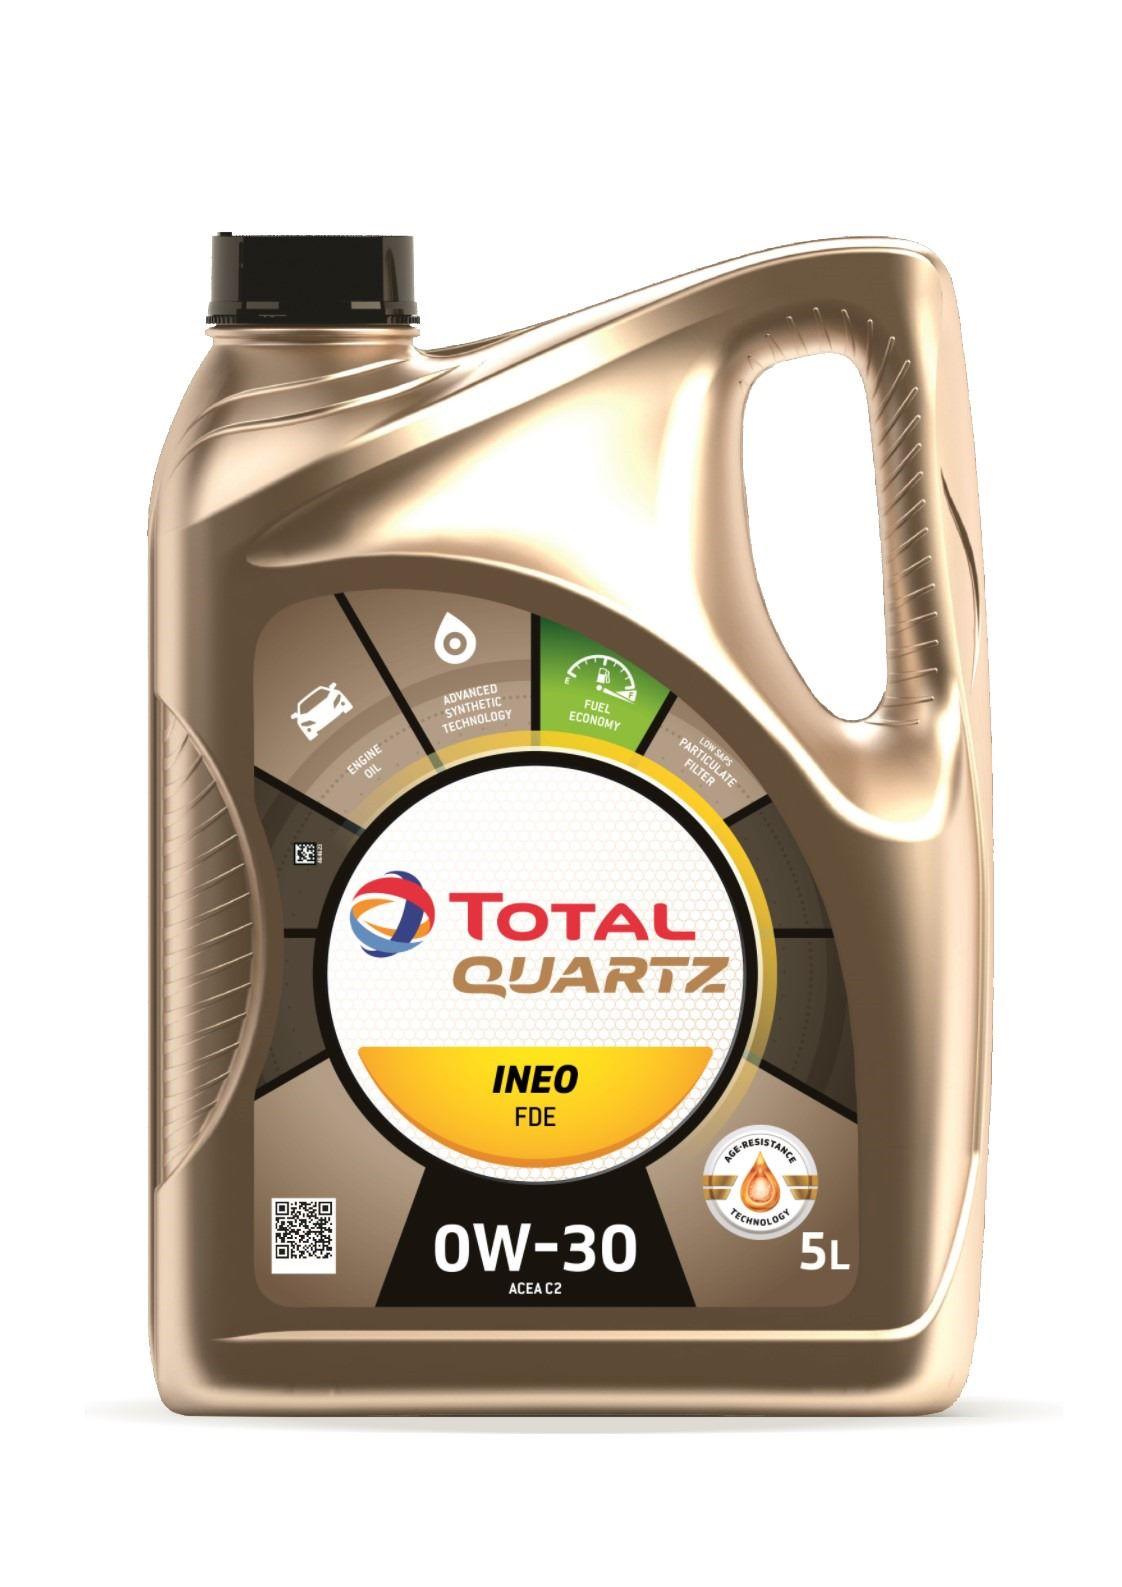 https://commercial.fordfuels.co.uk/wp-content/uploads/sites/10/Quartz-Ineo-FDE-0w-30-318x450.jpg+https://commercial.fordfuels.co.uk/wp-content/uploads/sites/10/Quartz-Ineo-FDE-0w-30-636x900.jpg